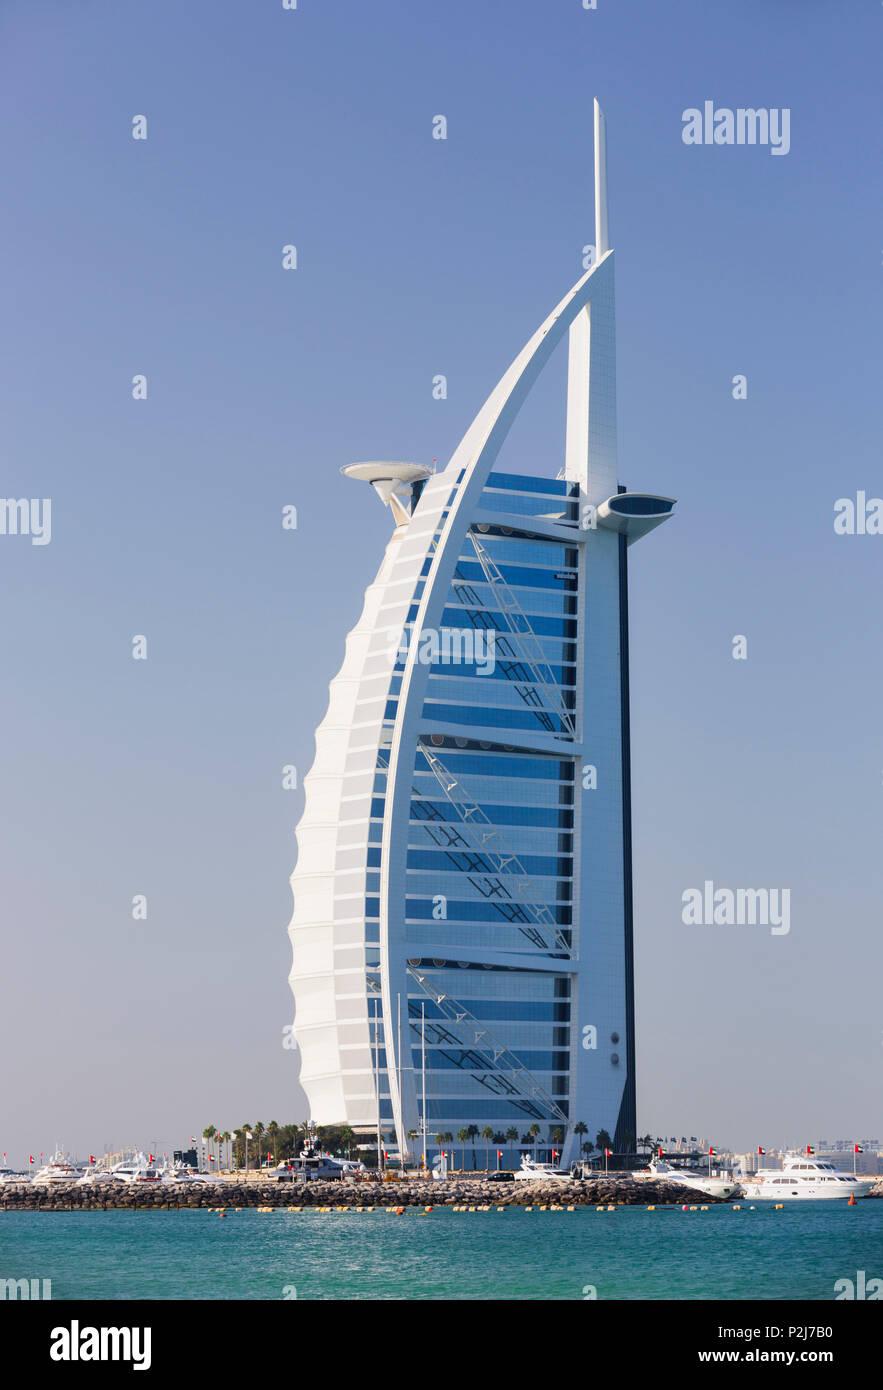 Luxury Hotel Burj Al Arab, Dubai, Unites Arab Emirates, UAE - Stock Image